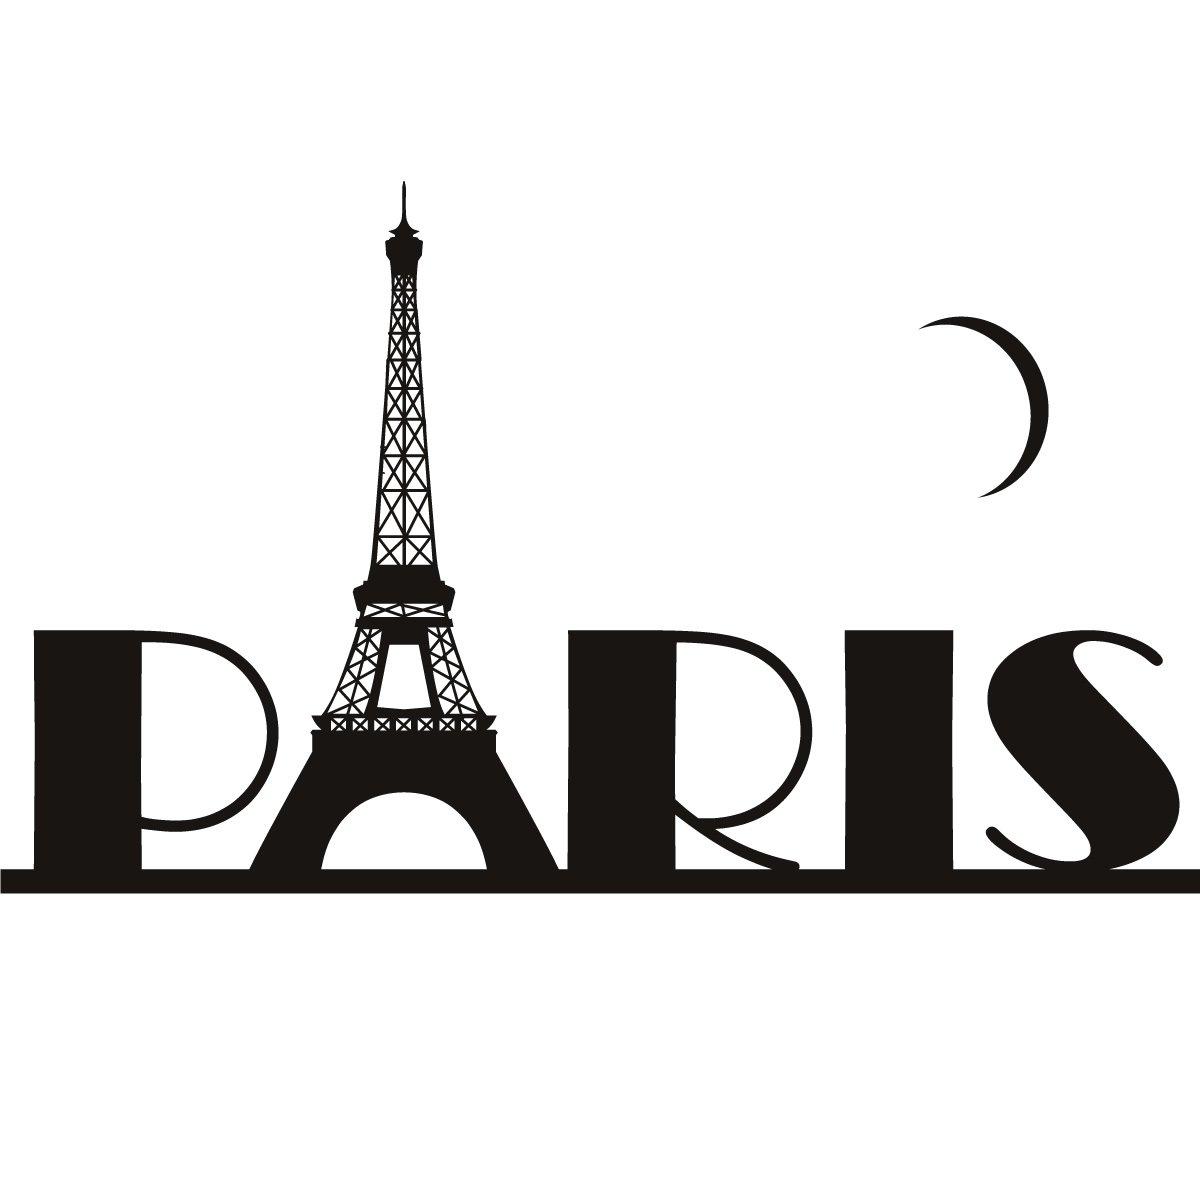 eiffel tower clipart border clipartfox - Paris Eiffel Tower Coloring Pages